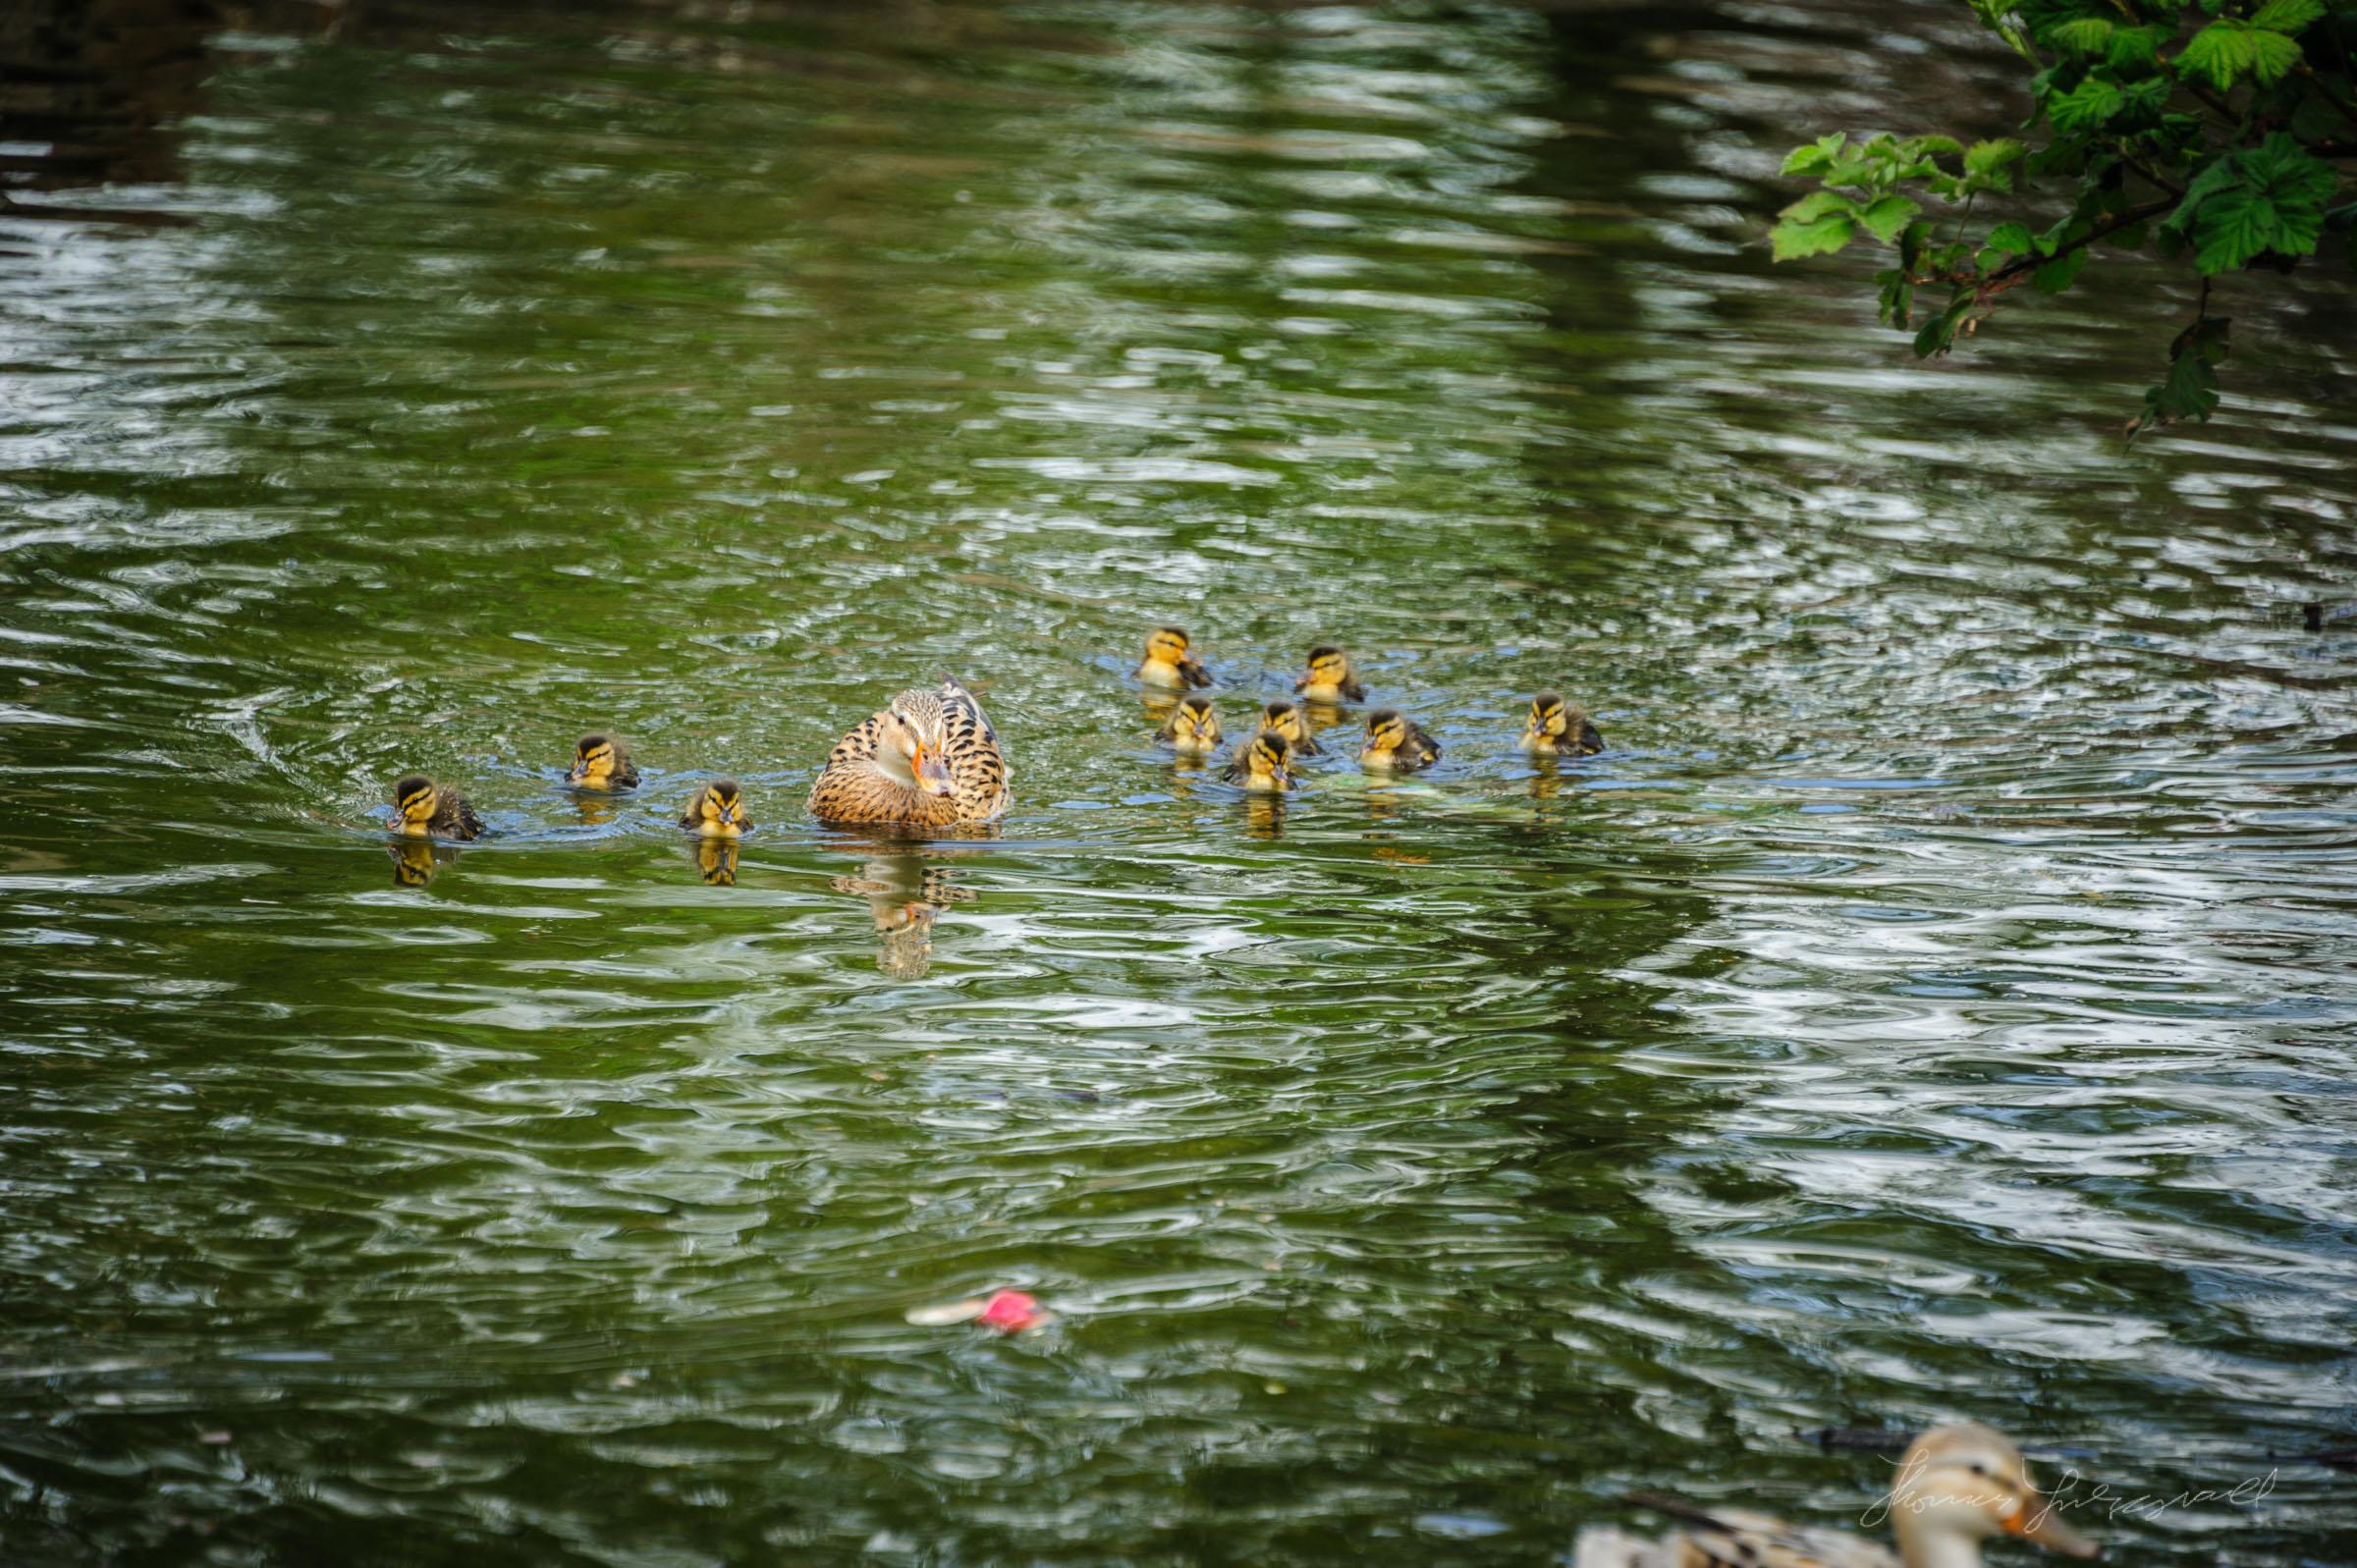 ducklings in herbert park, in dublin